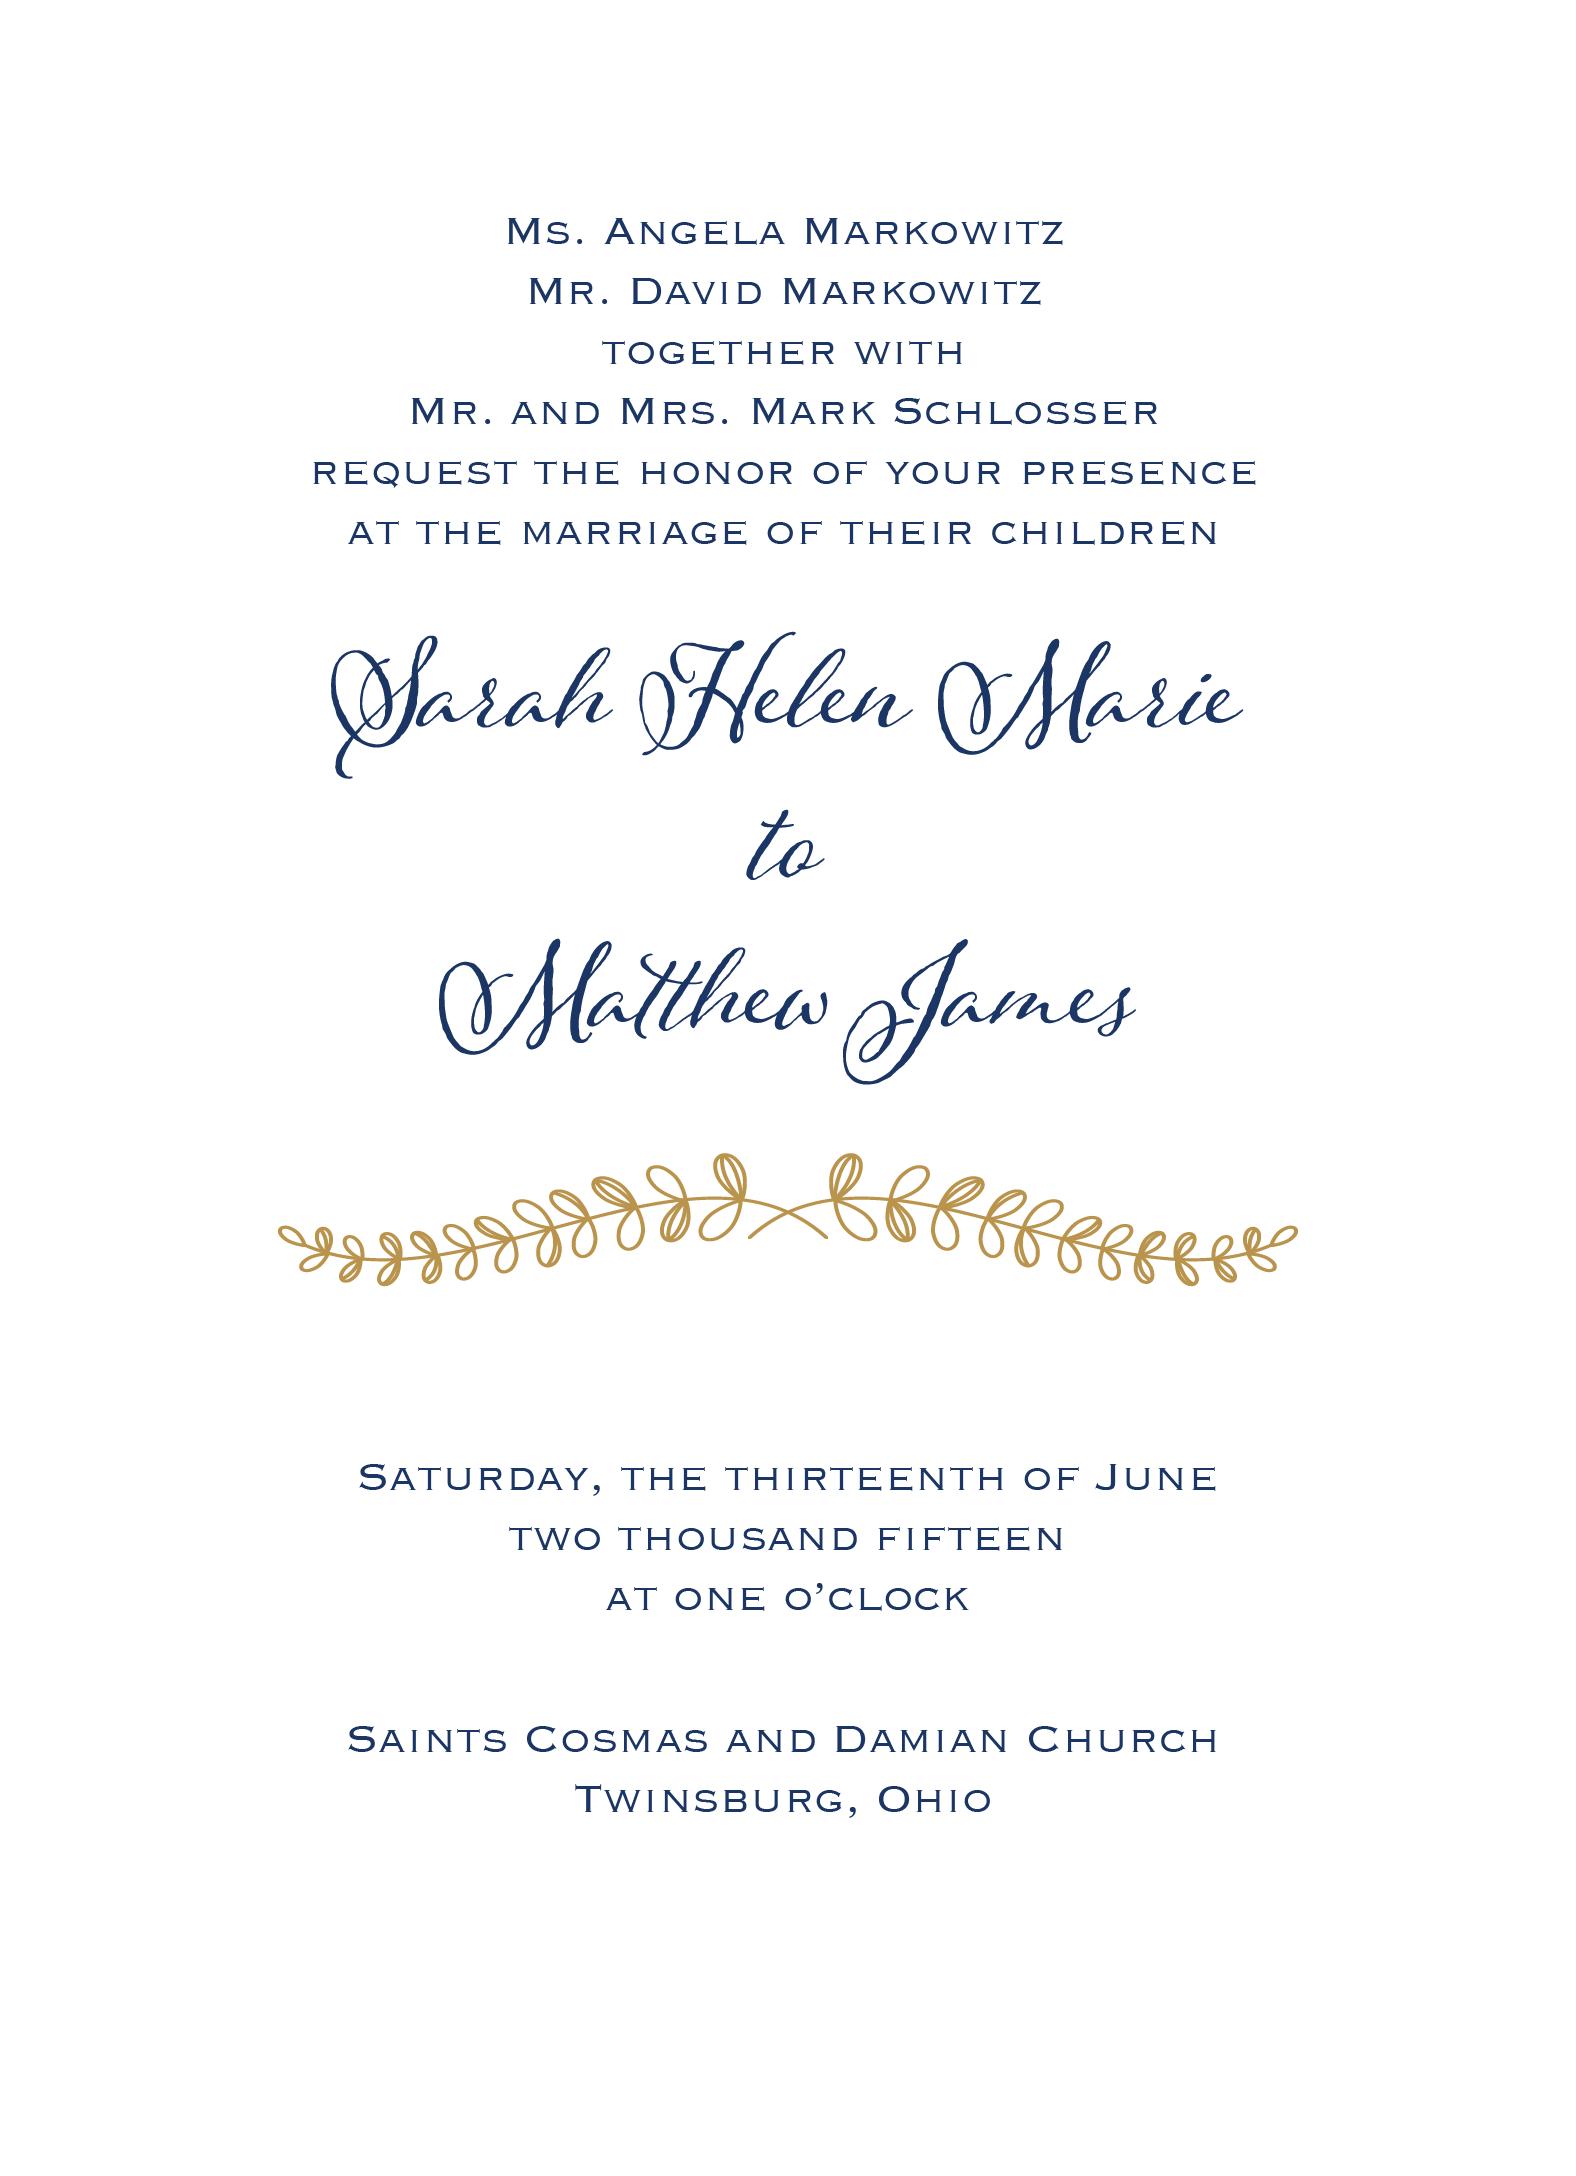 Sarah_Gray Wedding Suite_Invitation.png